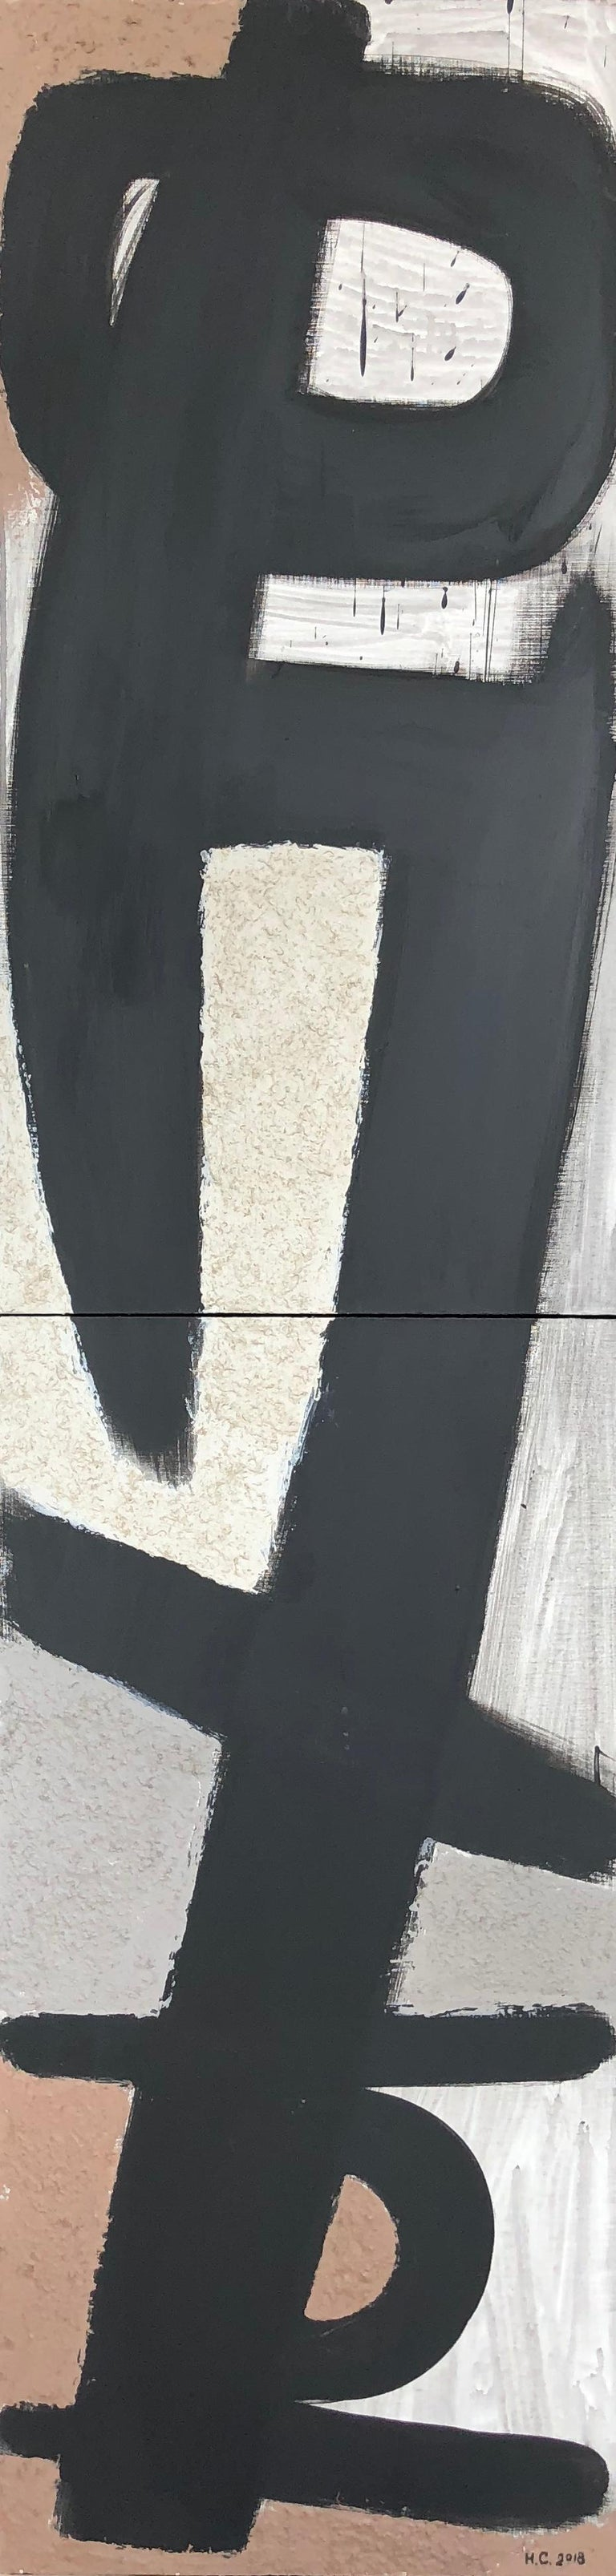 From Vertical Series II & III - art in dark in black, grey, beige, peach puff - Abstract Painting by Natalia Sitnikova